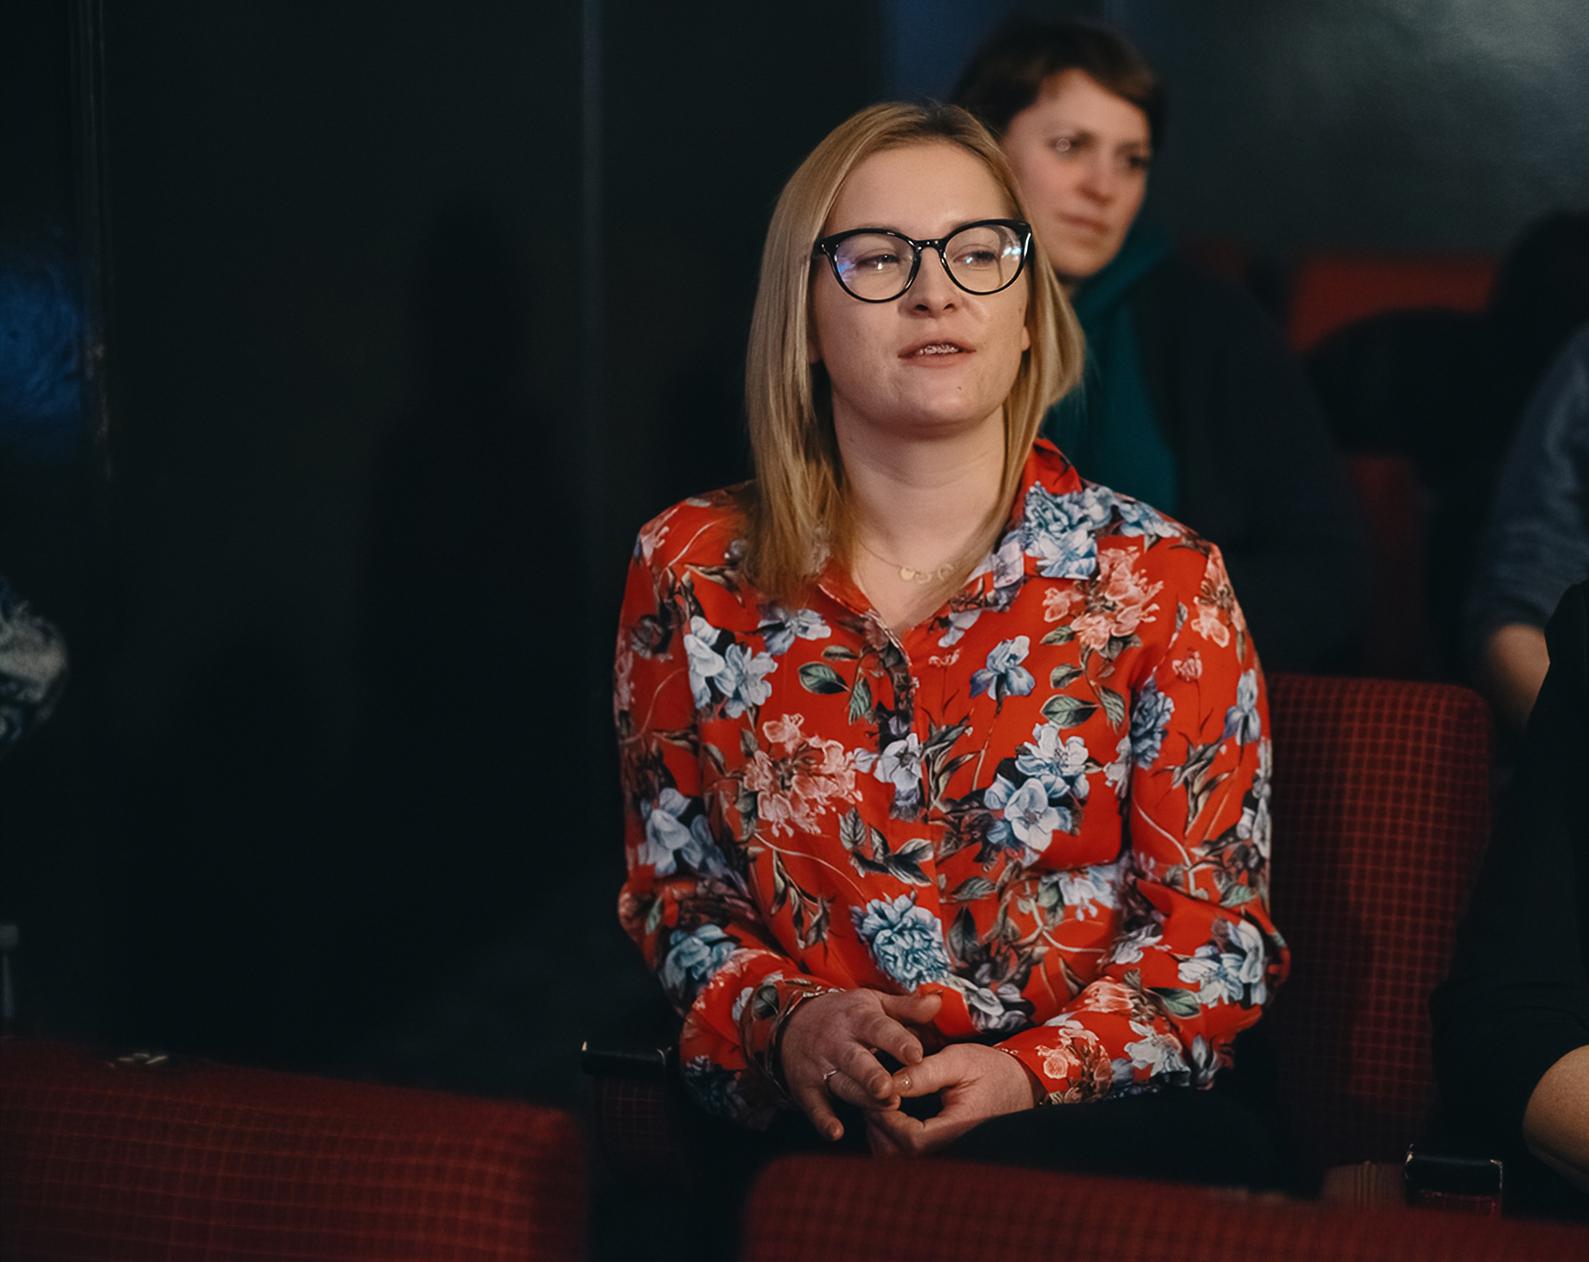 Dyplomy FNC 2019 studentki Szczecin